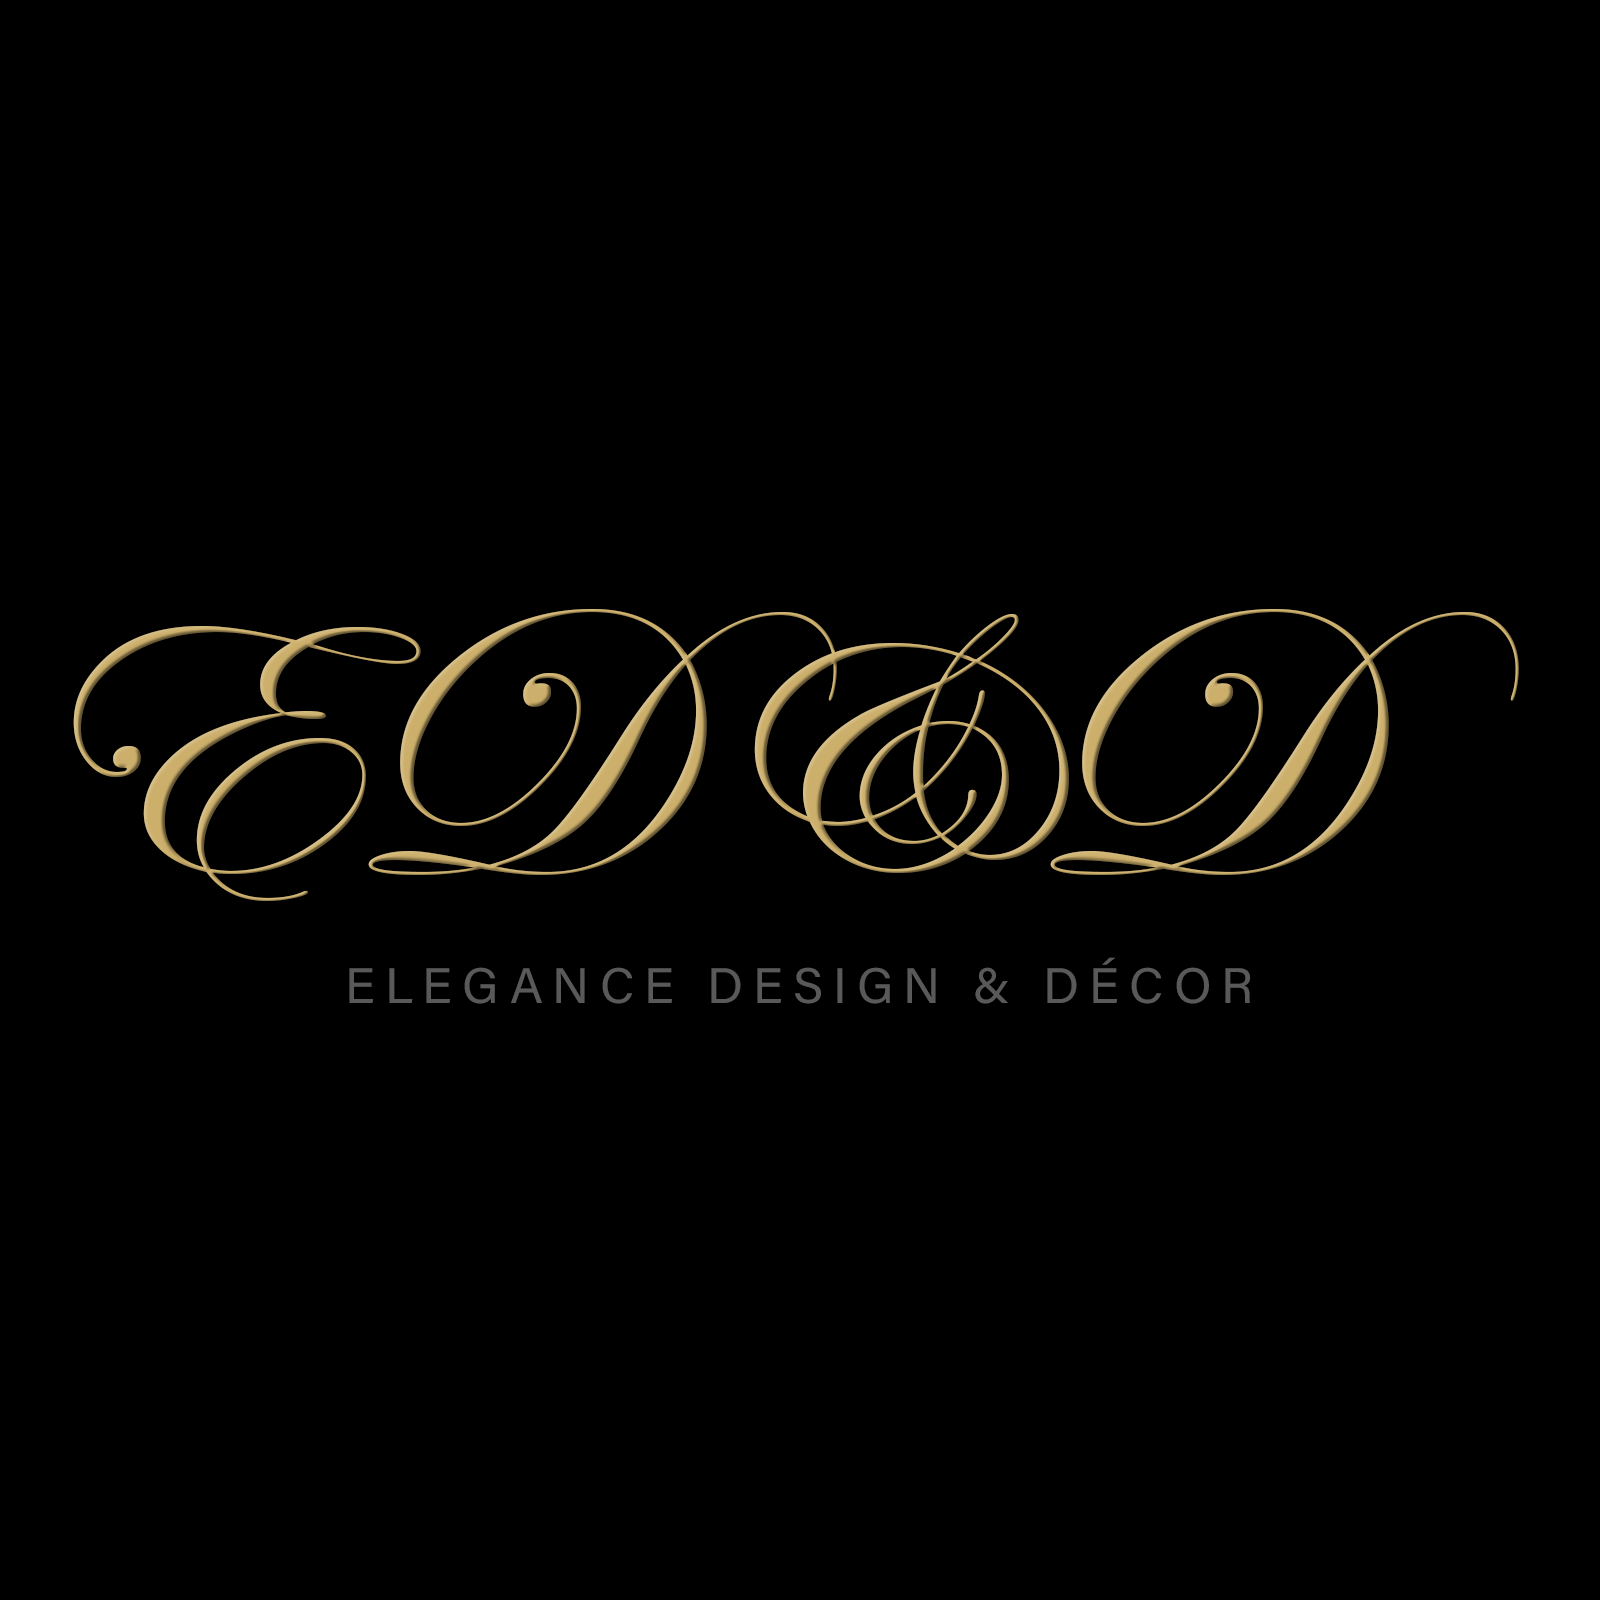 edd_logo_col_blk_sq